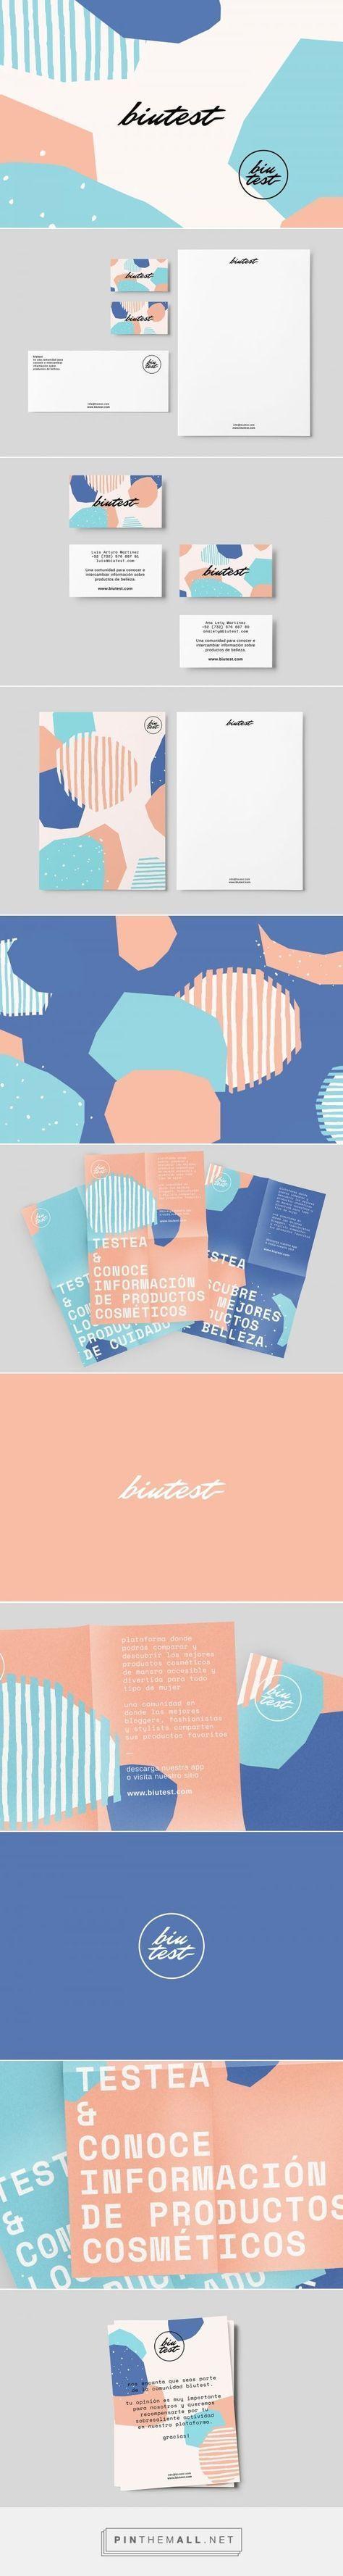 BIUTEST Online Beauty Community Branding by Dum Dum Design Office | Fivestar Branding Agency – Design and Branding Agency & Curated Inspiration Gallery